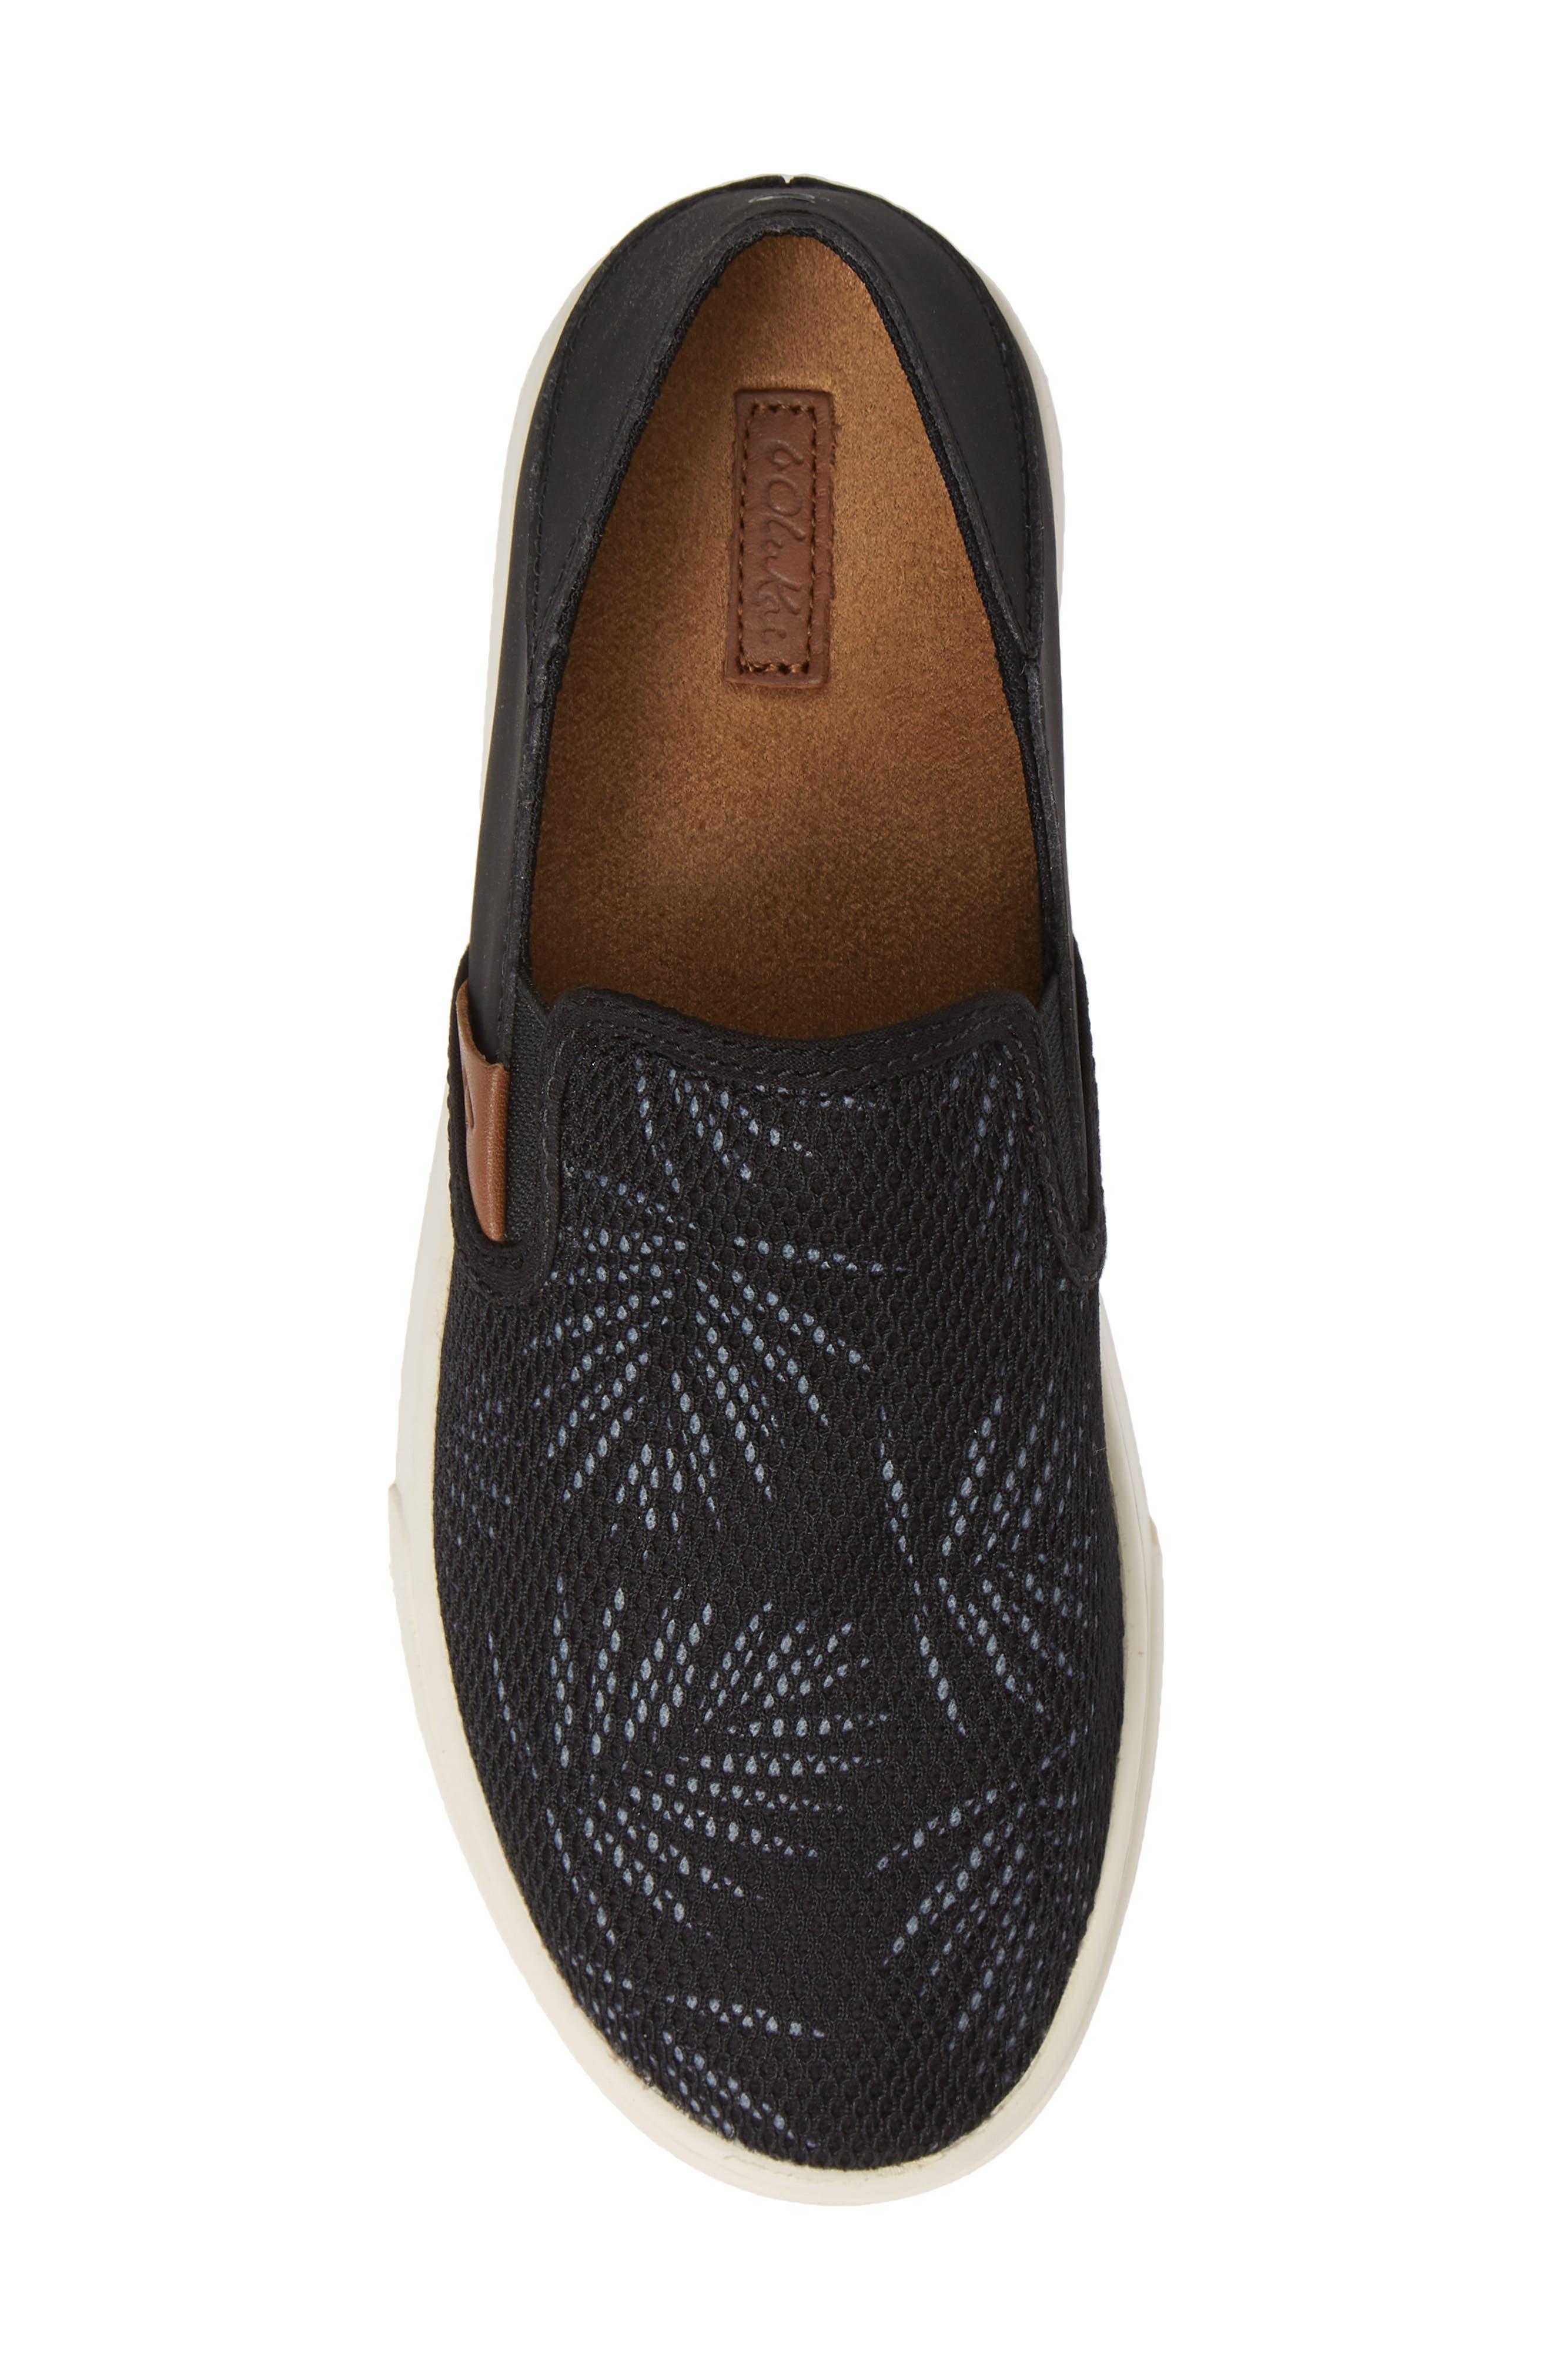 OLUKAI, 'Pehuea' Slip-On Sneaker, Alternate thumbnail 5, color, BLACK/ PALM FABRIC